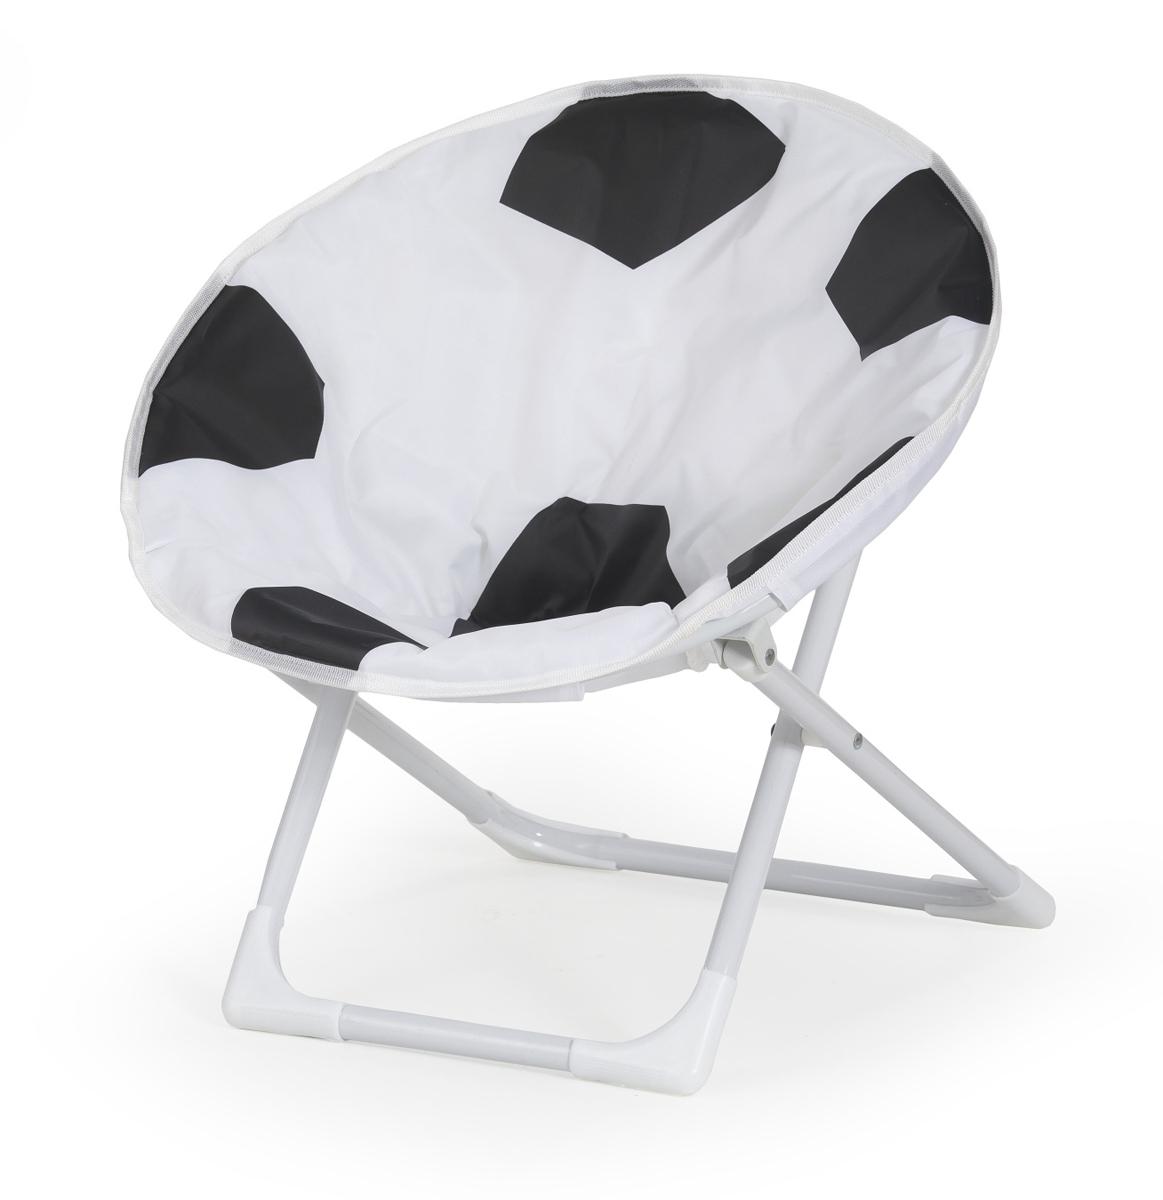 Detské kresielko - Halmar - Football